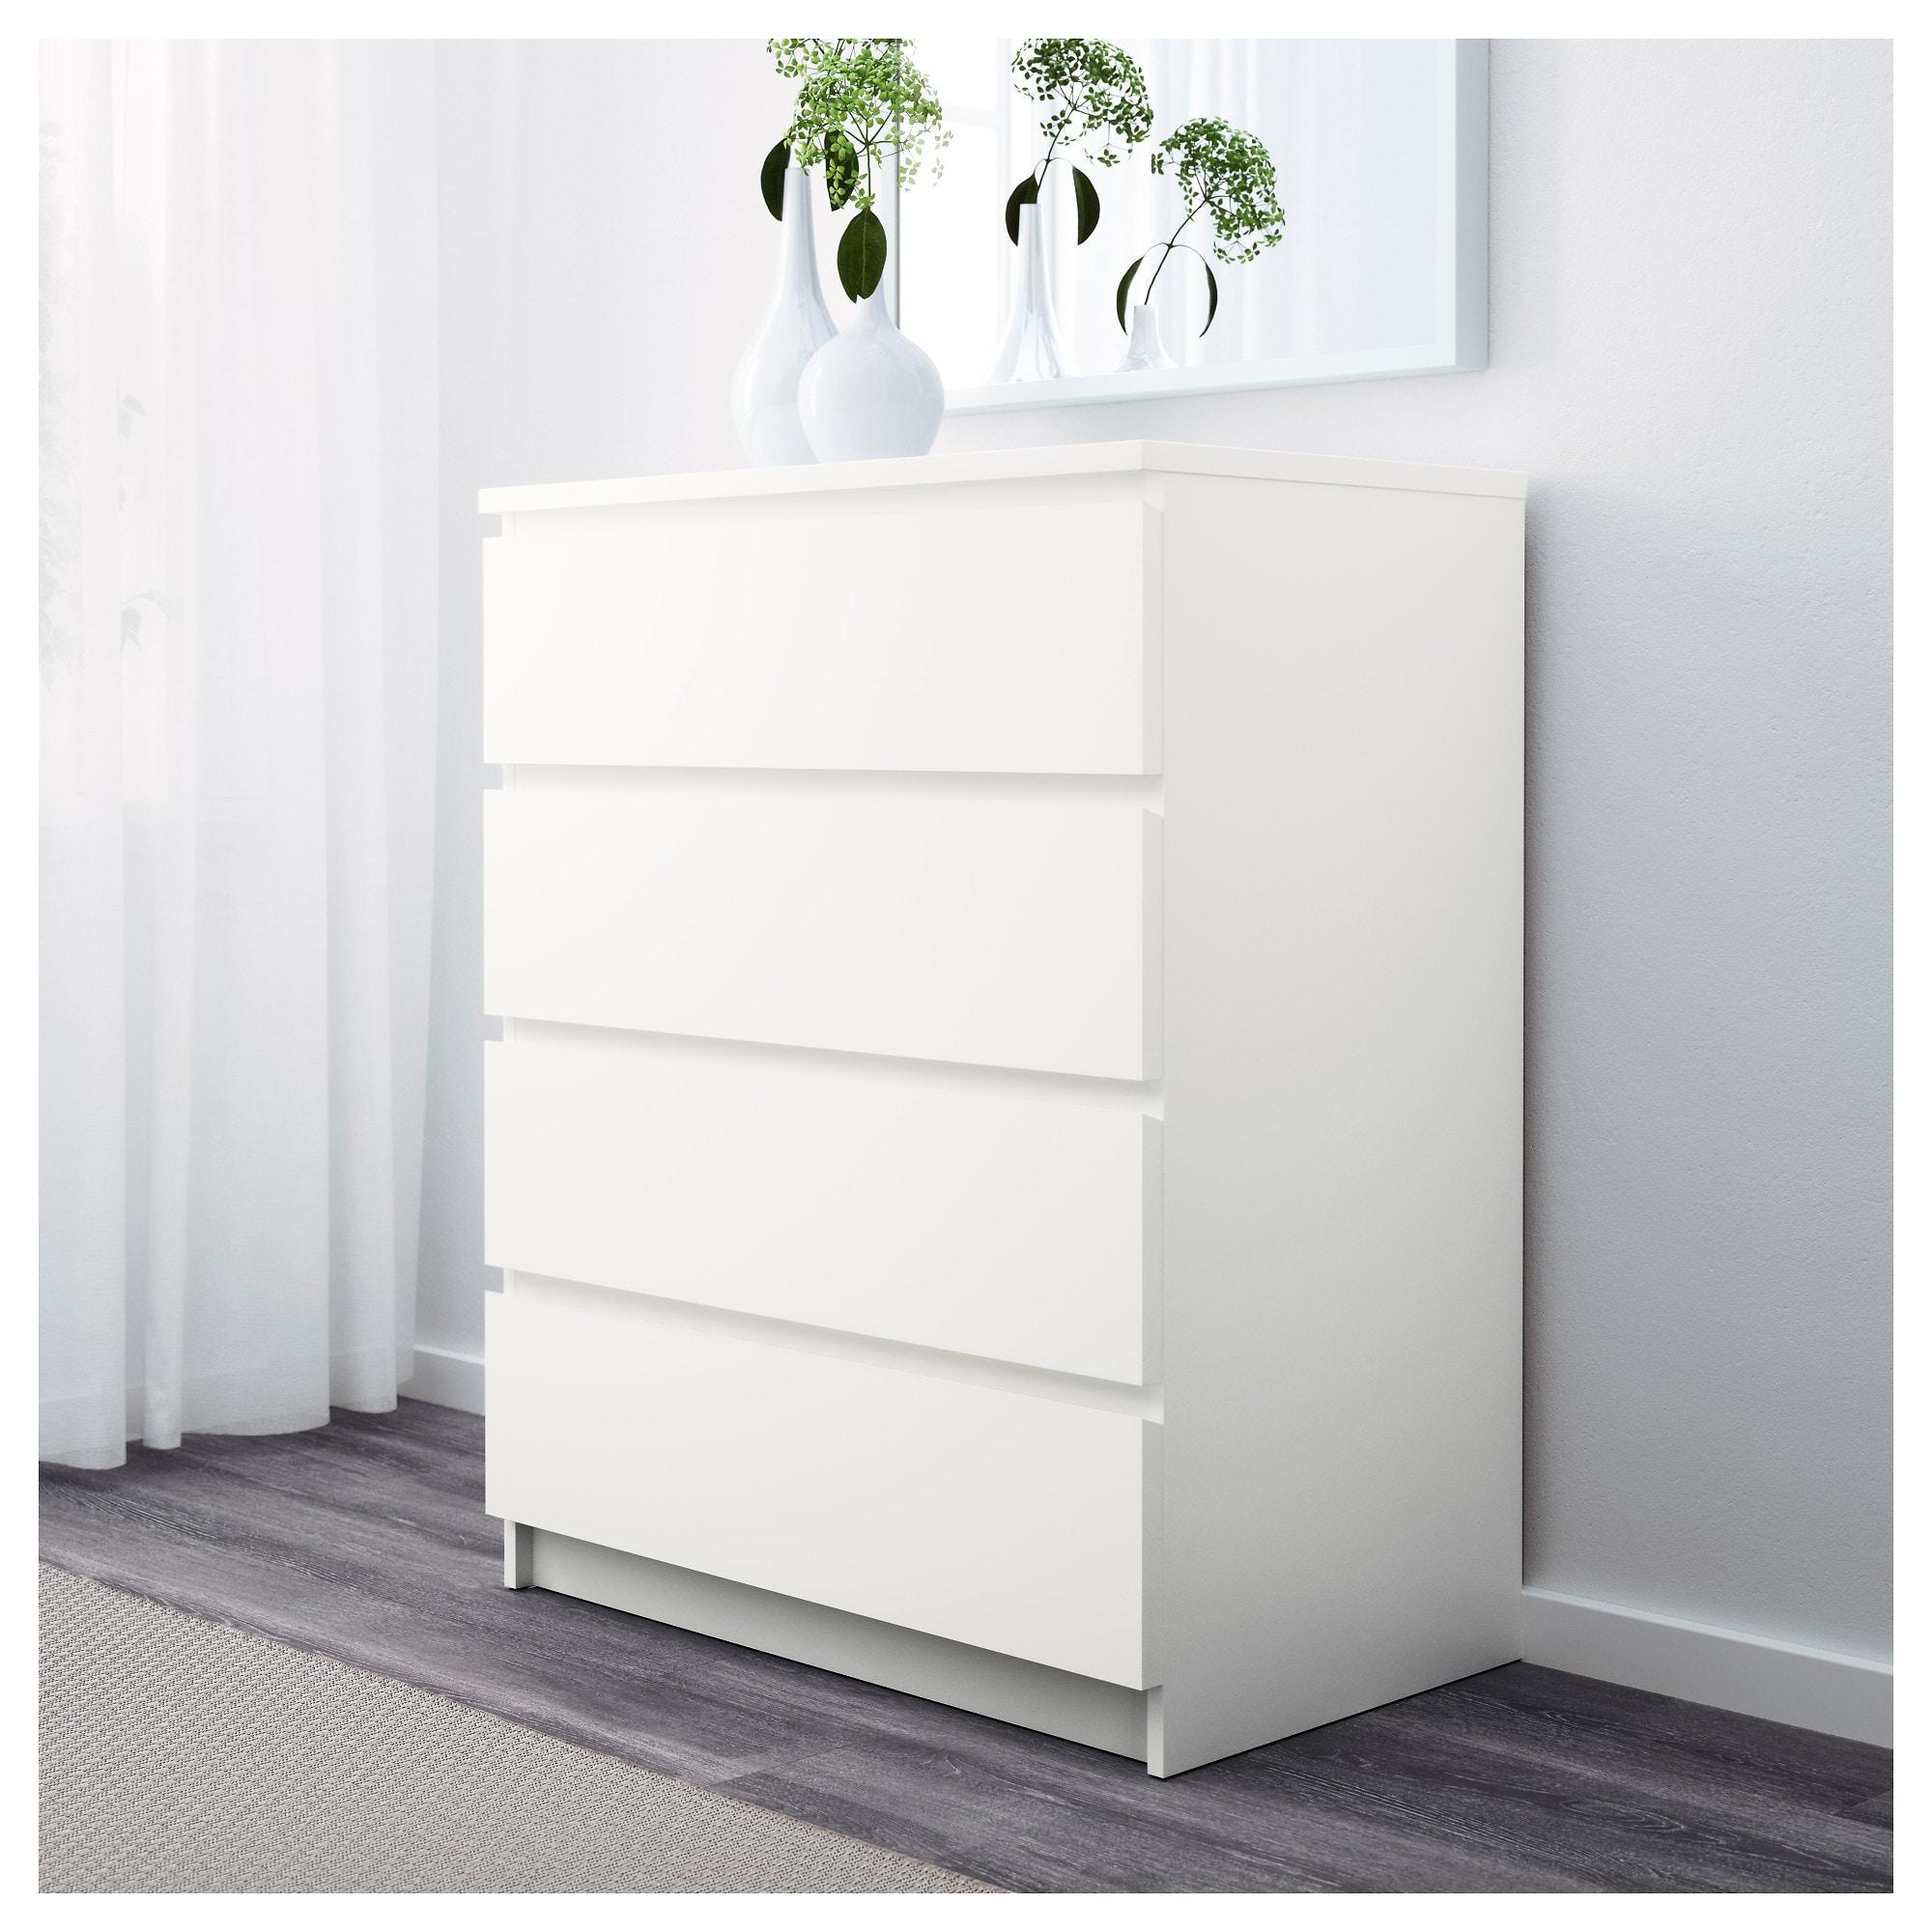 Malm Chest Of 4 Drawers White 80x100 Cm Www Megastore Com Mt